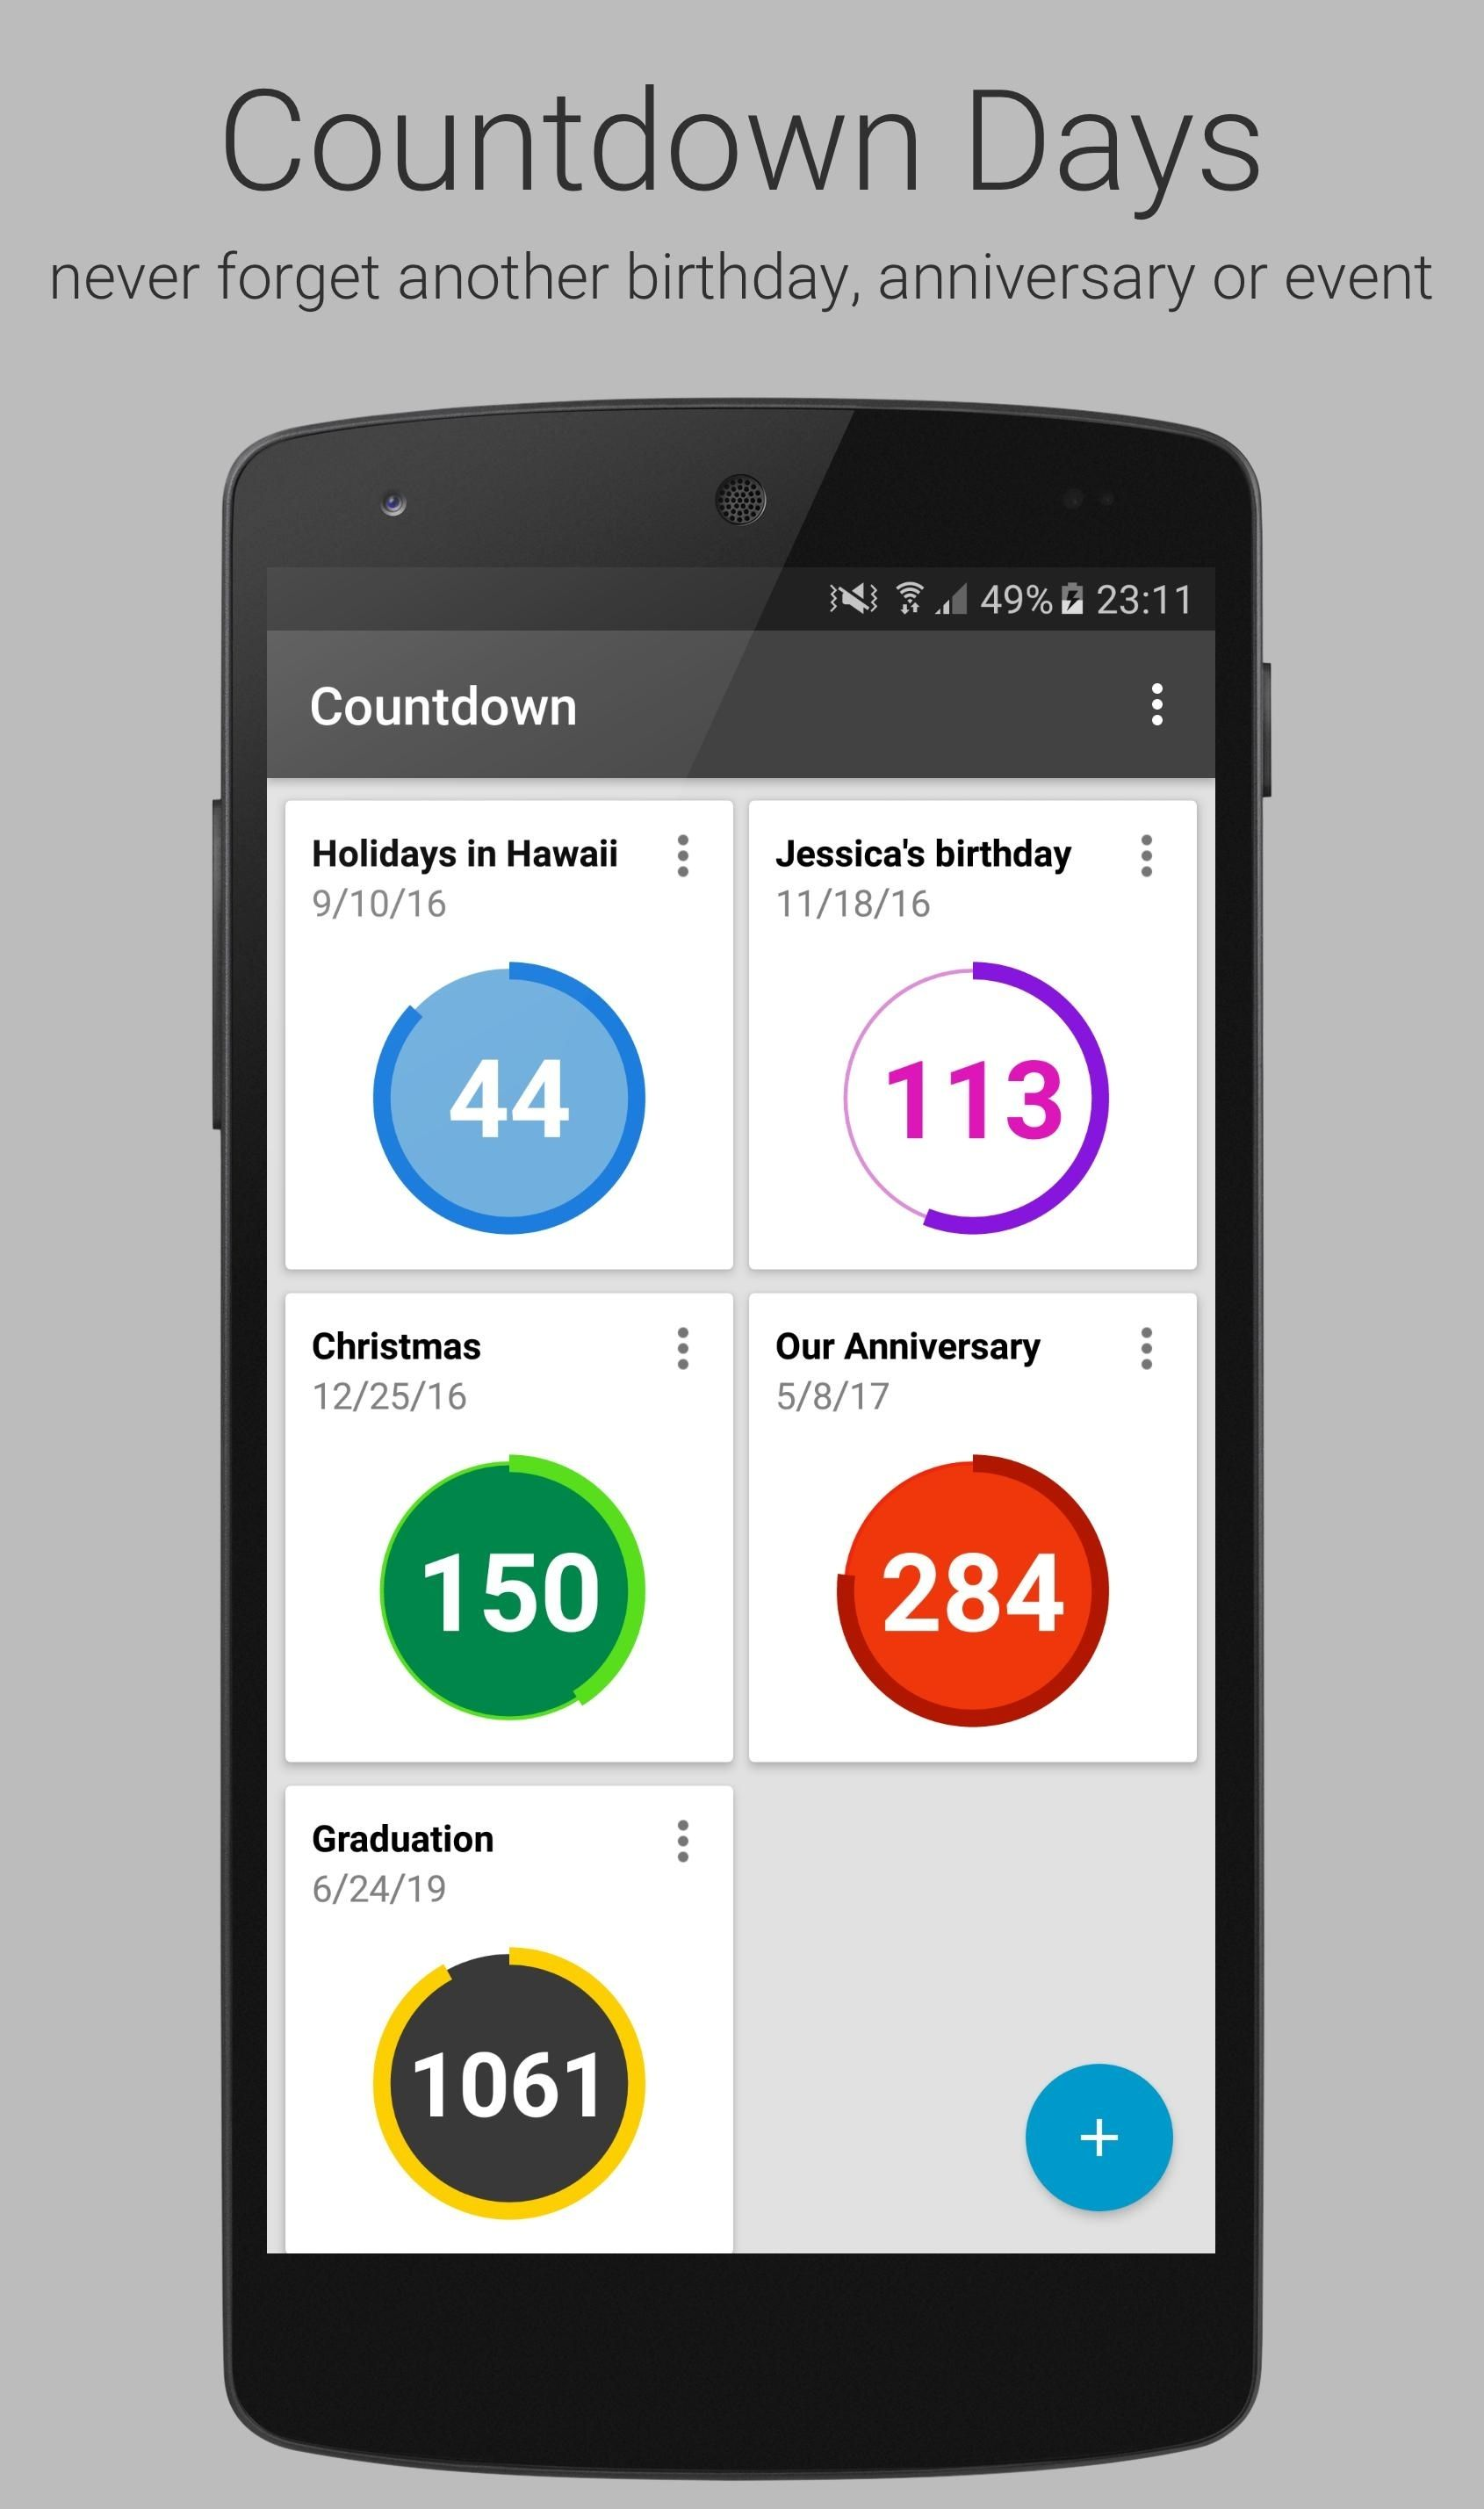 Countdown Calendar Widget Apk in 2020 Countdown calendar